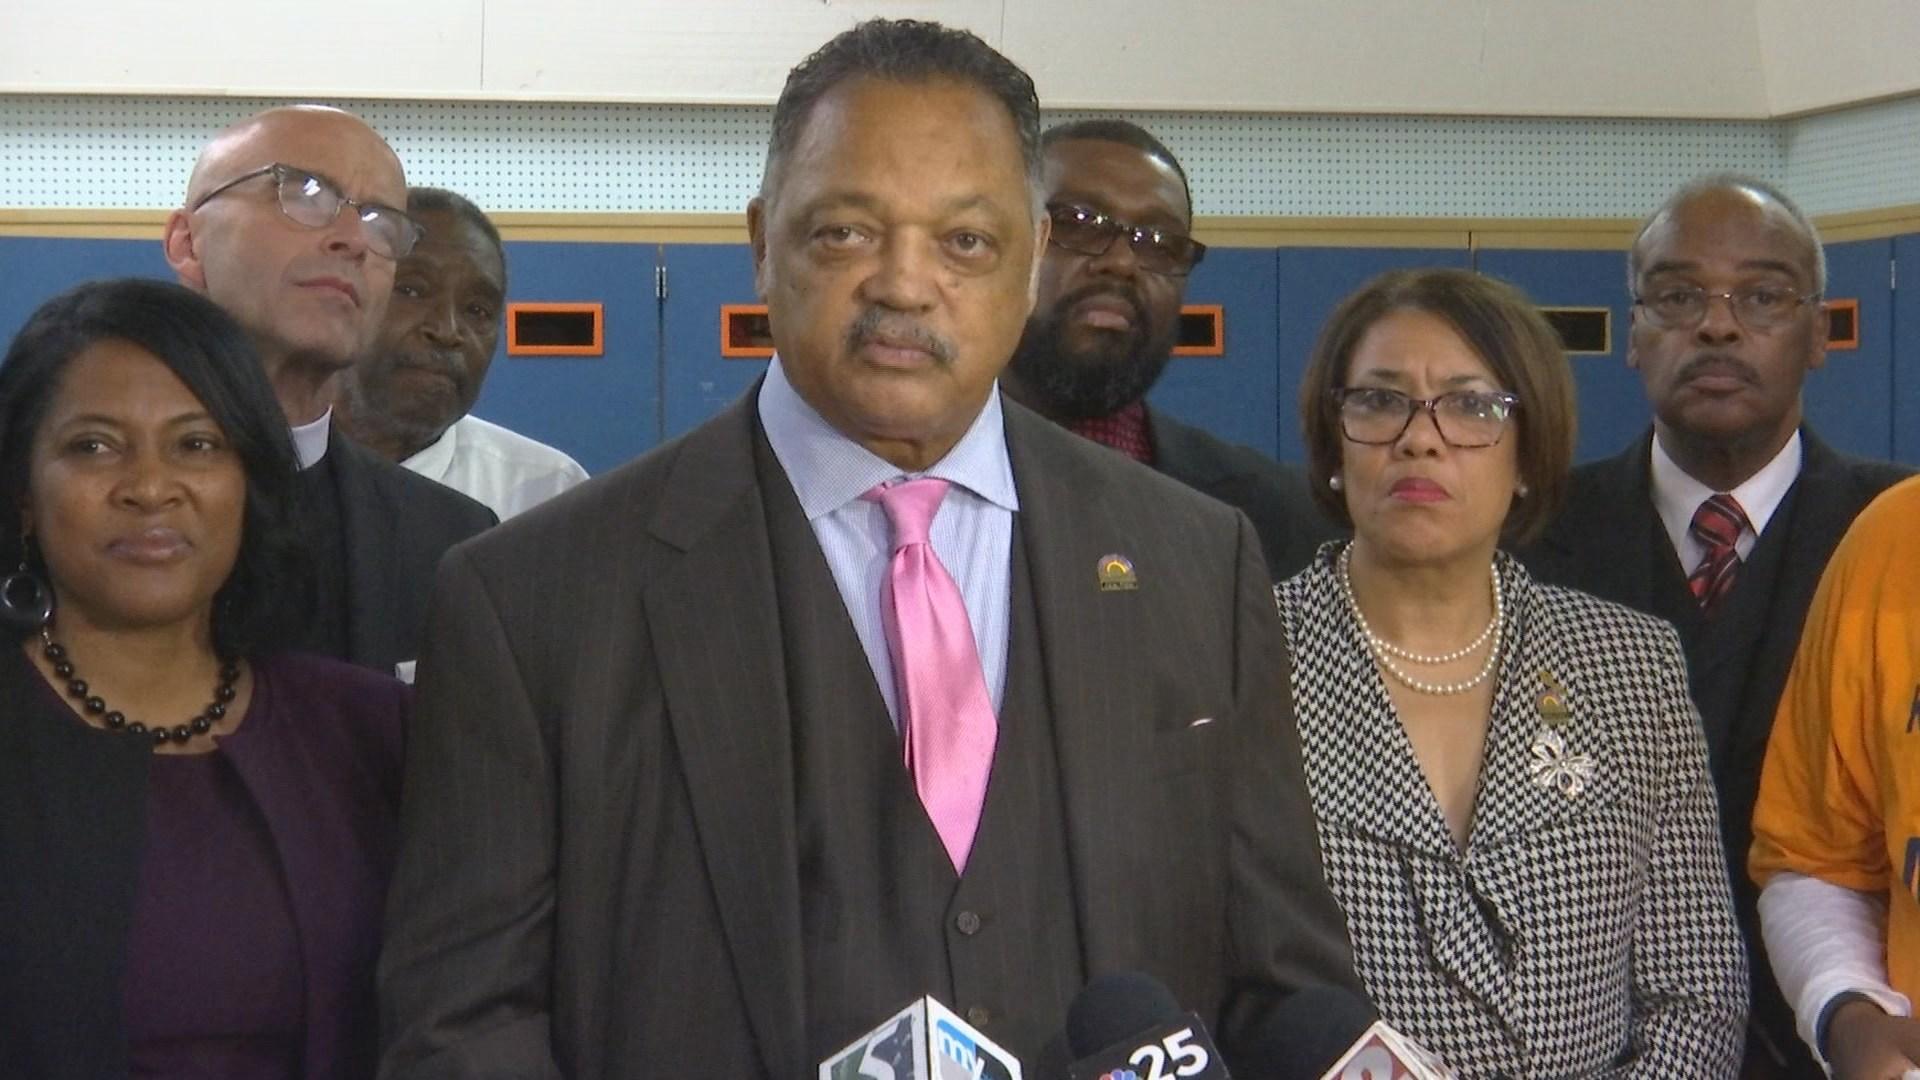 Incumbent Weaver survives recall, remains Flint's mayor